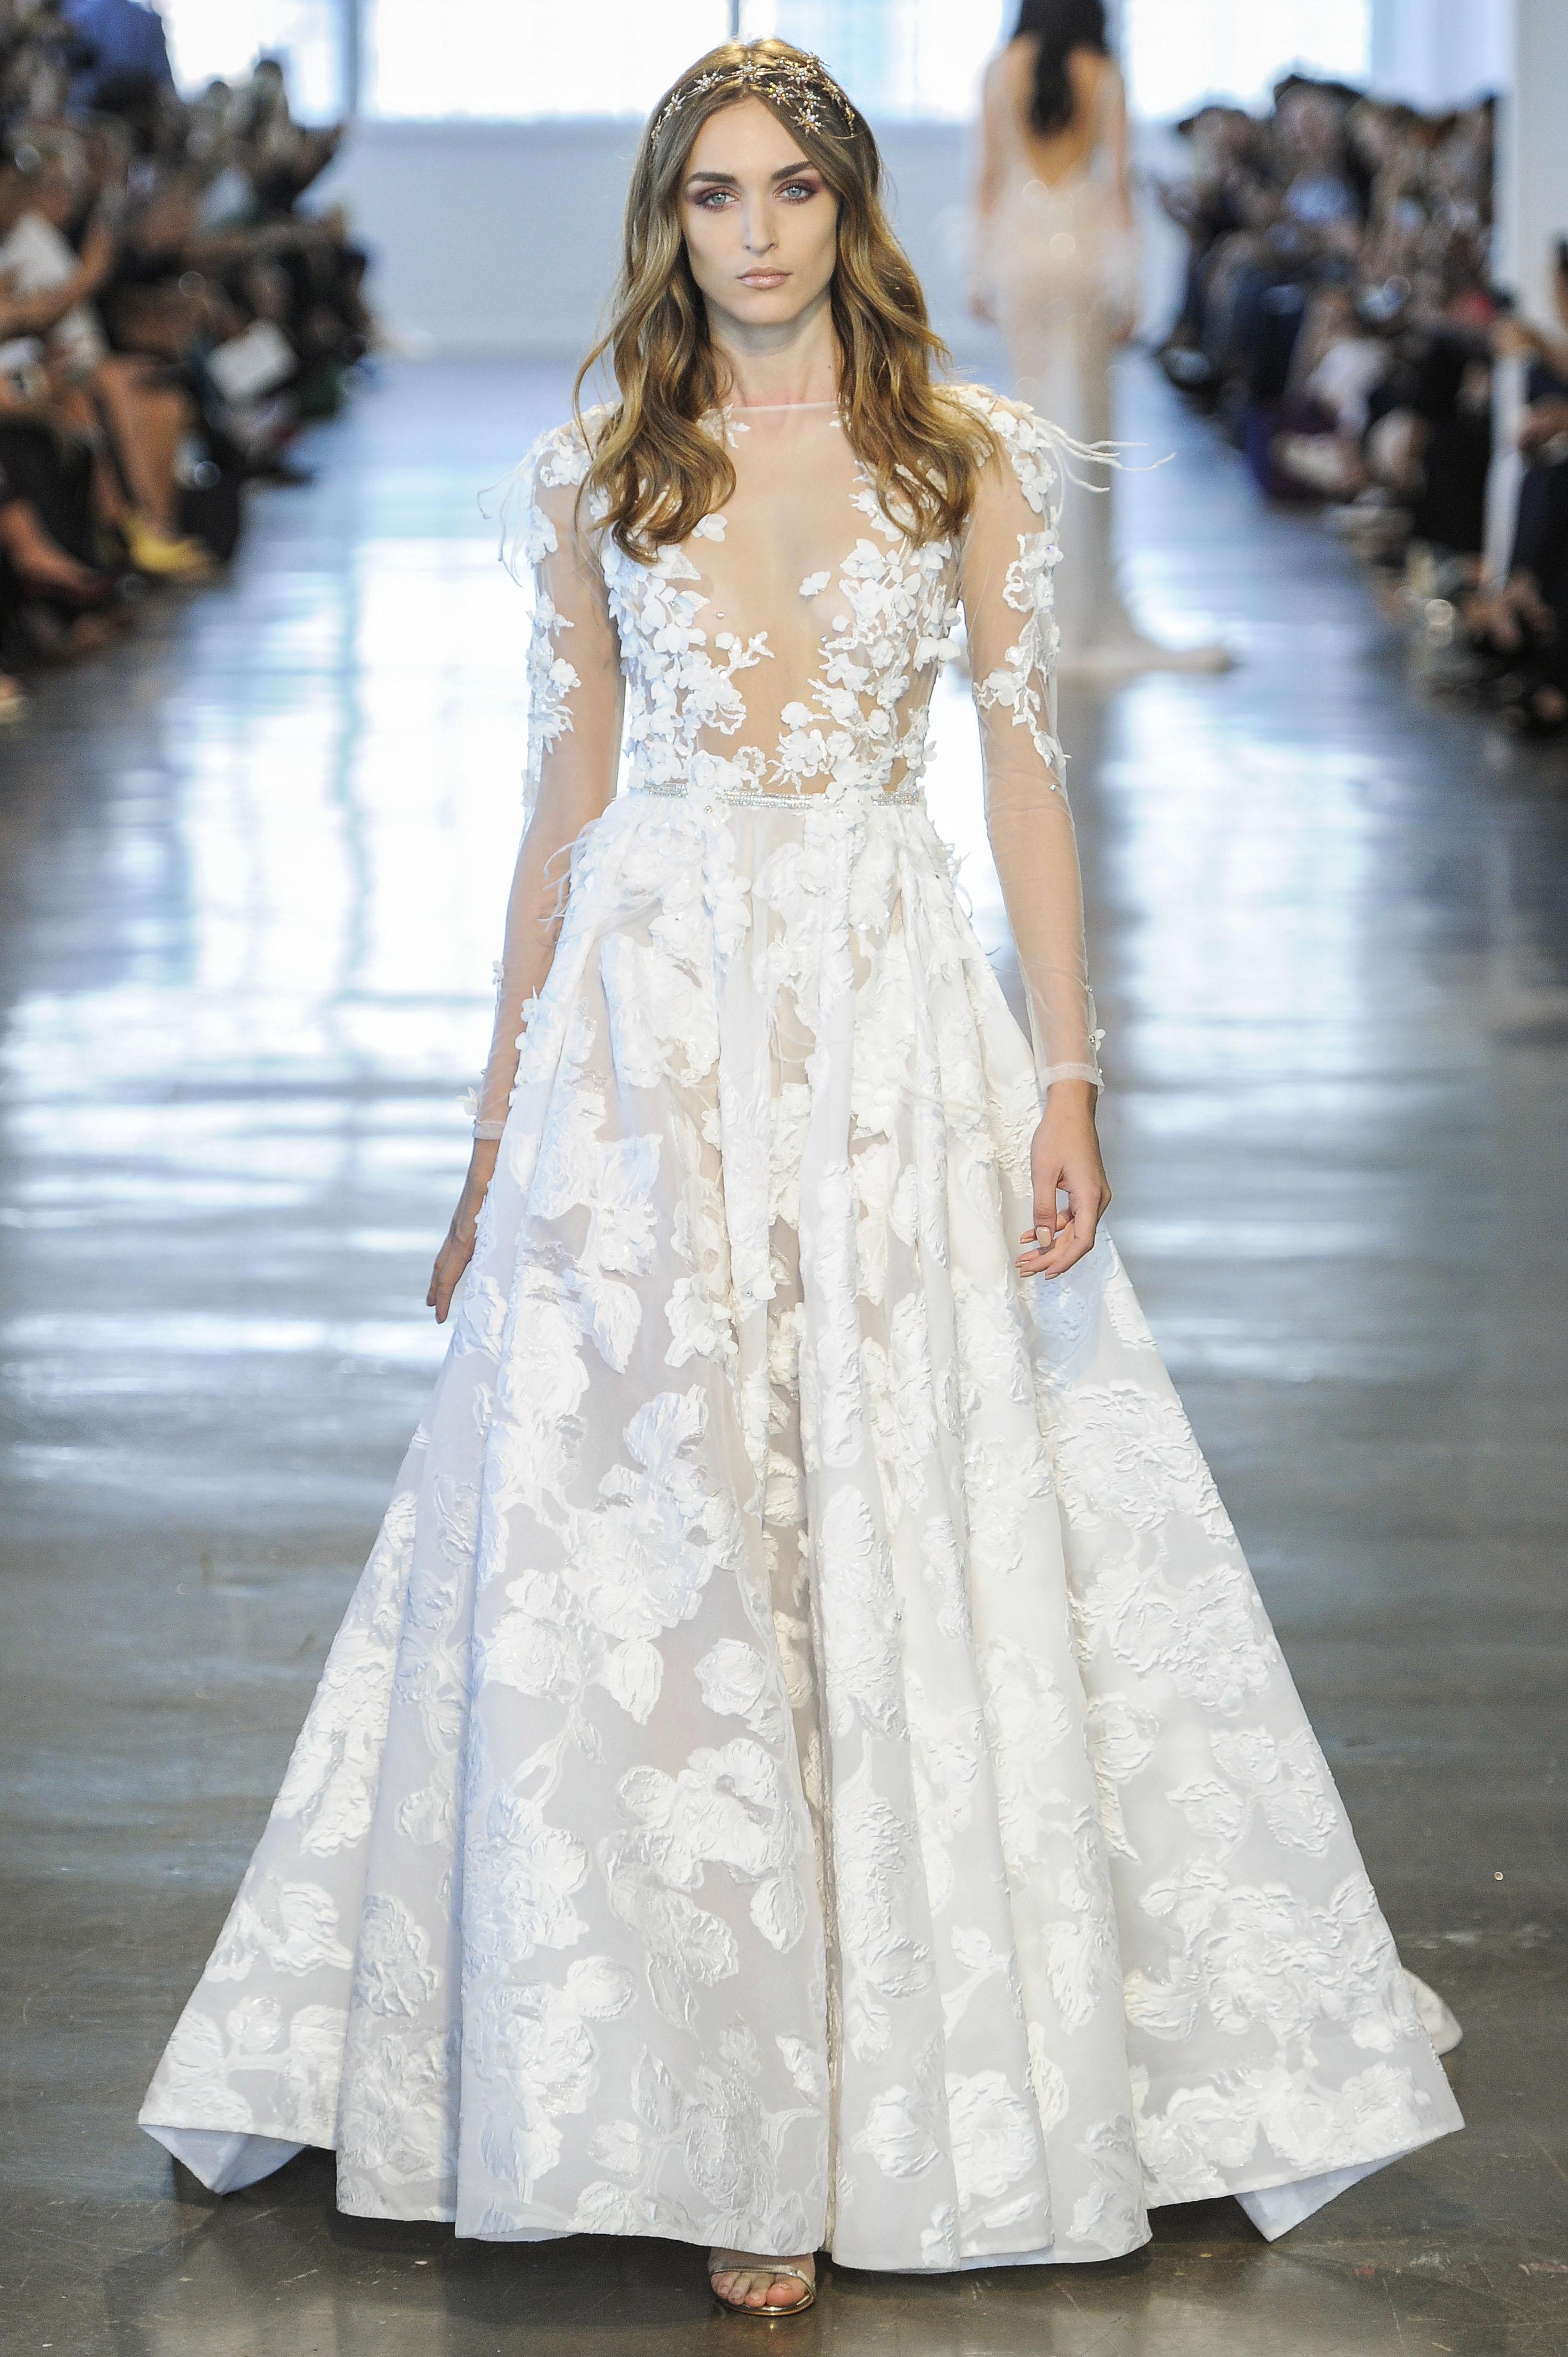 Berta Floral A-Line Wedding Dress Fall 2018